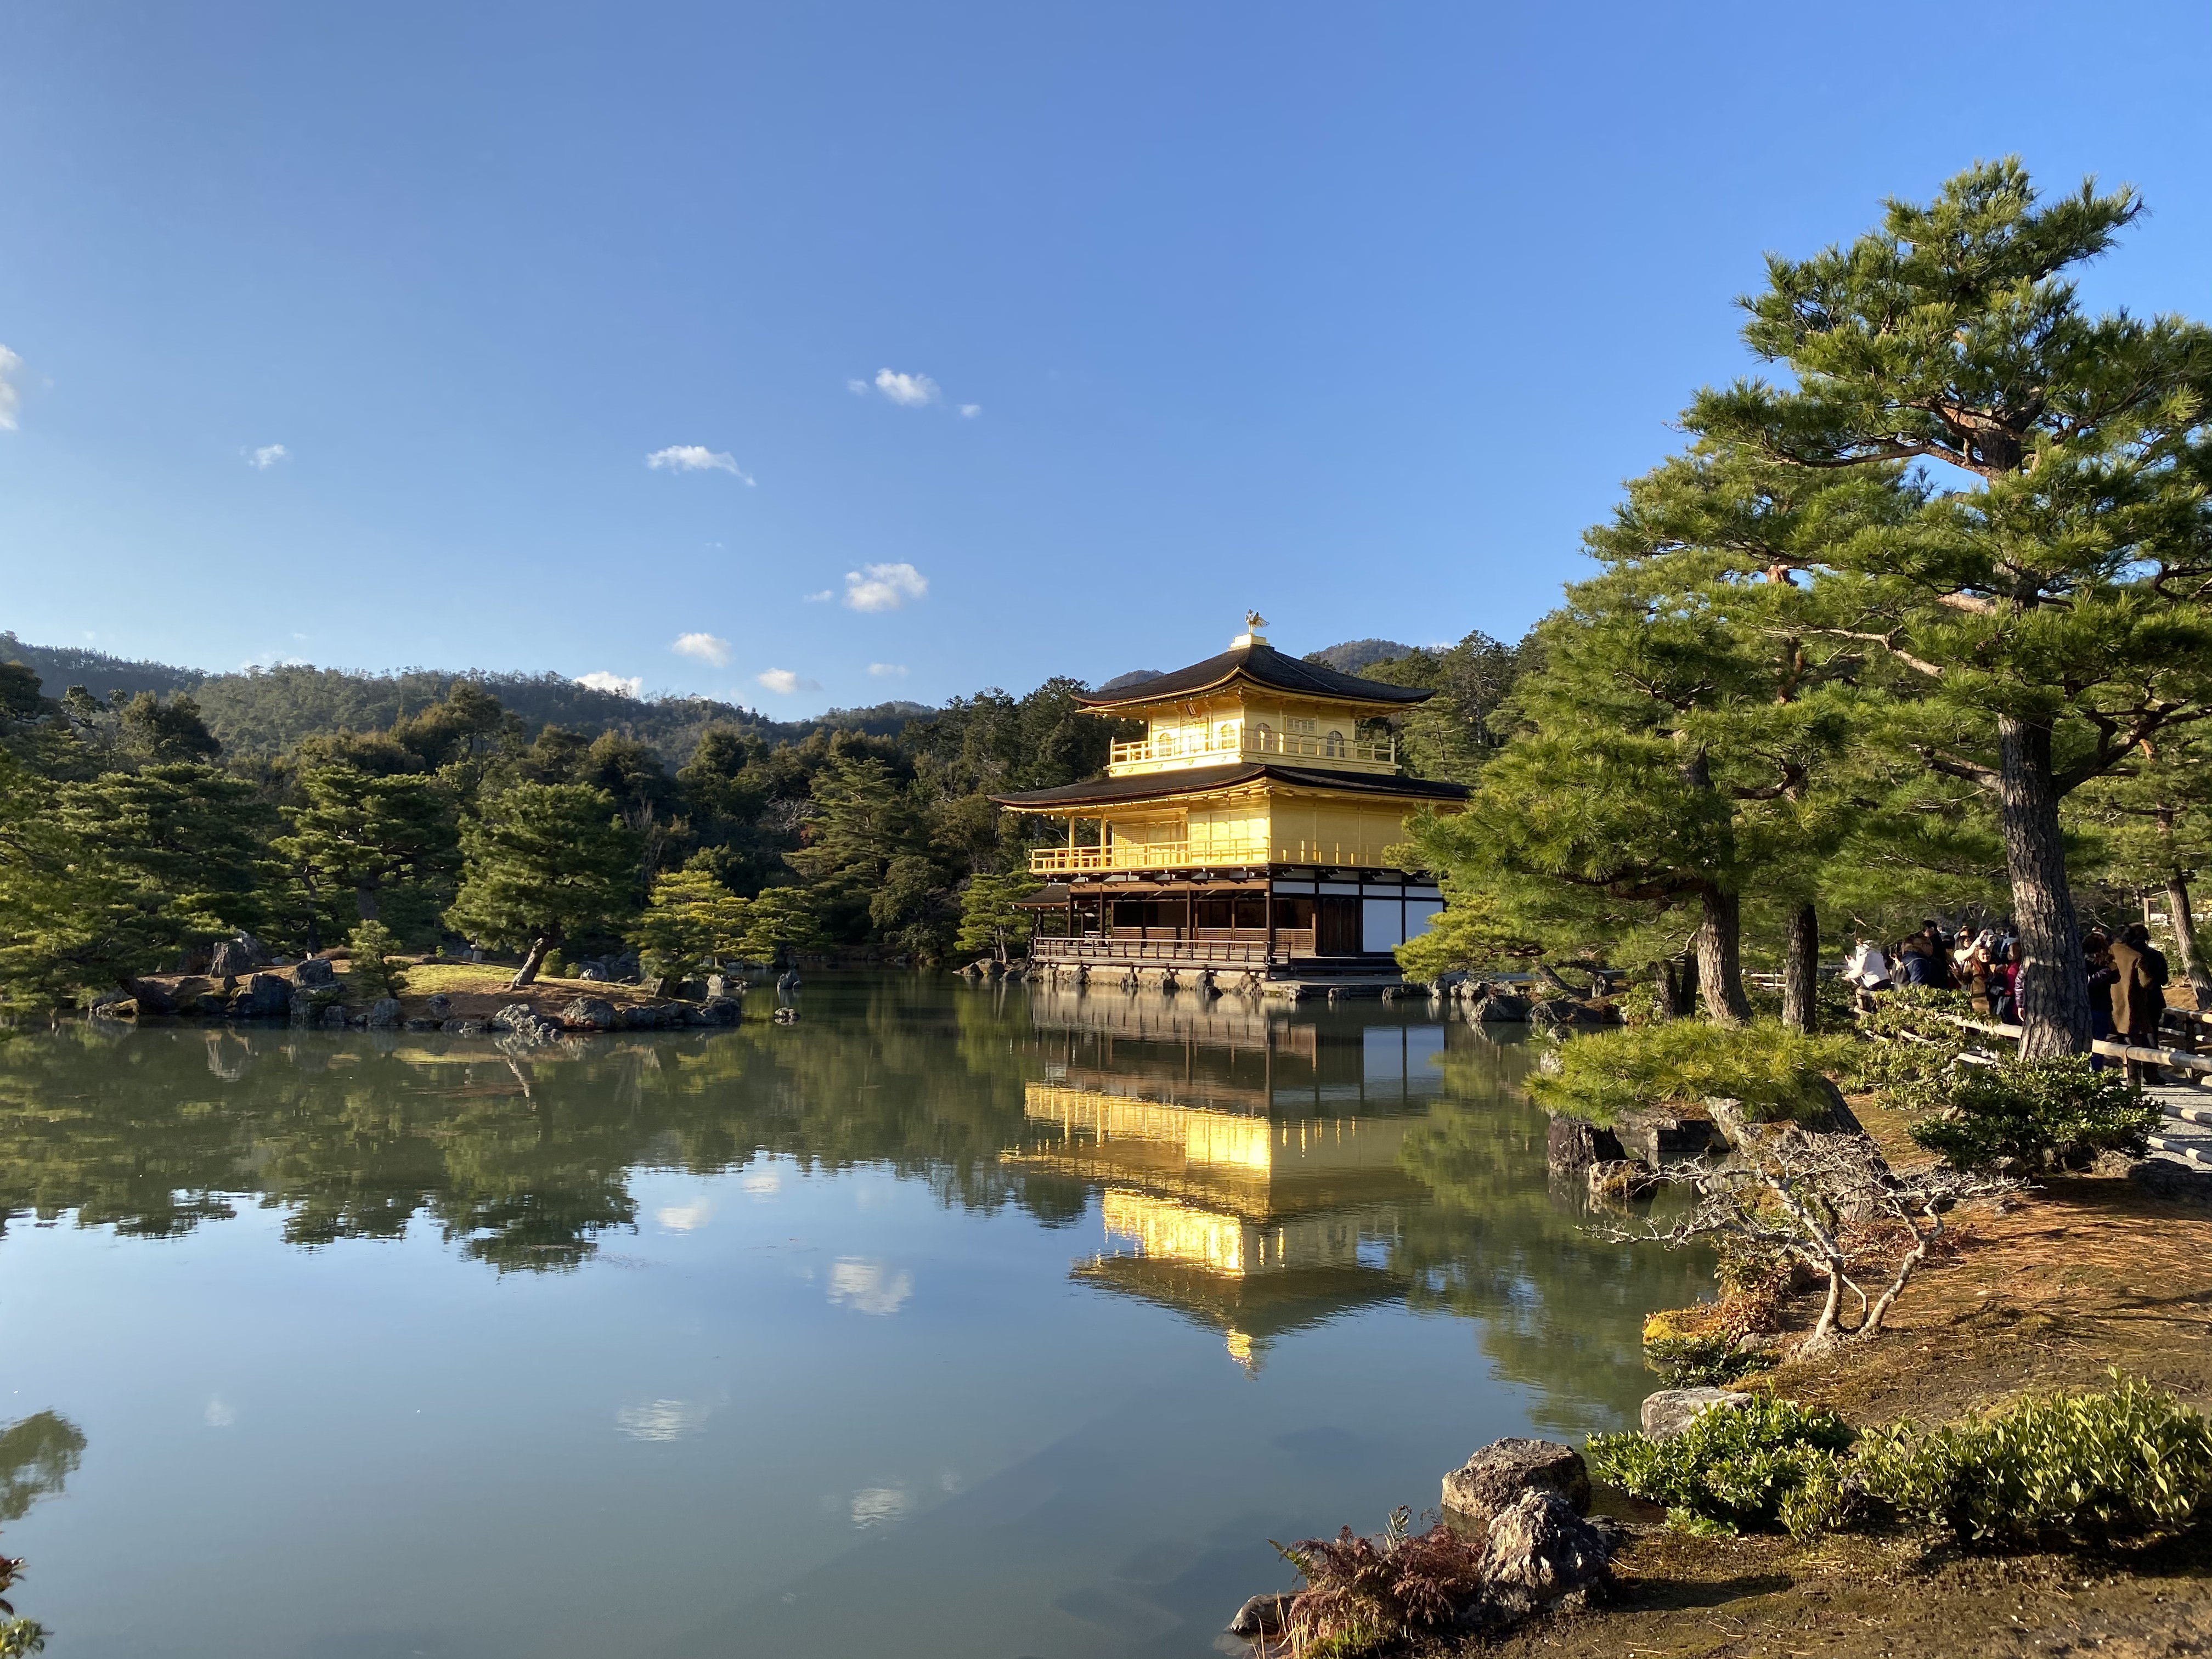 Kyoto UNESCO Historical Walking Tour - Golden Pavilion & Ryoanji